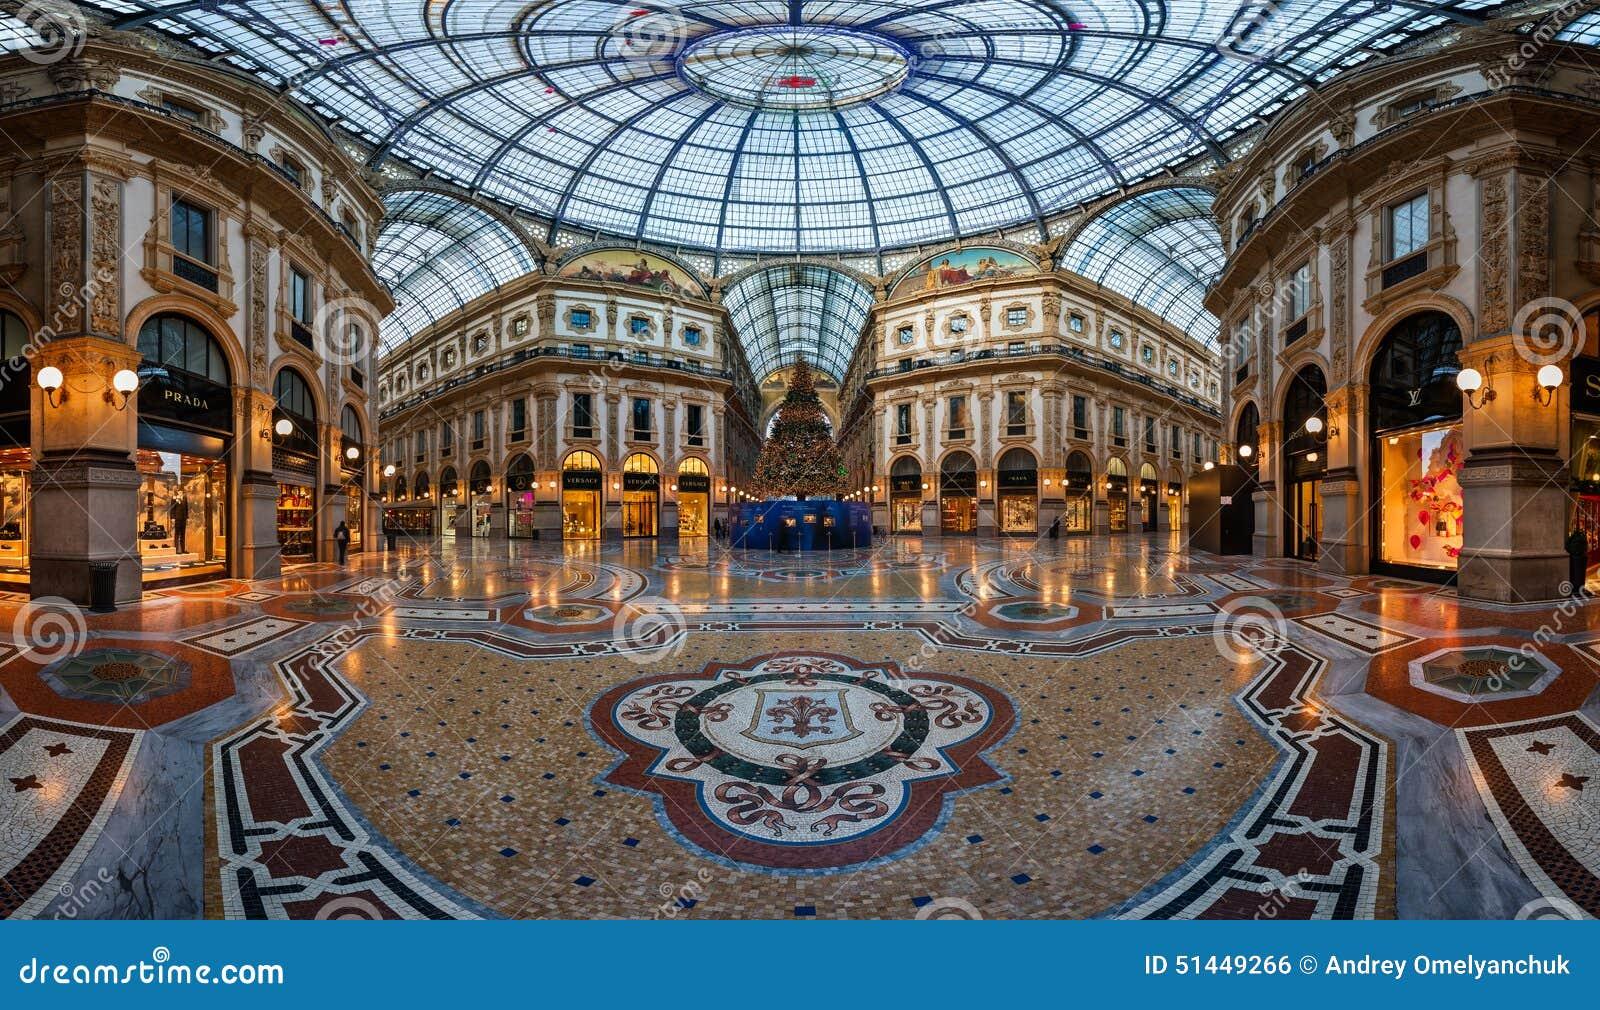 Mosaic Floor And Glass Dome In Galleria Vittorio Emanuele Ii In